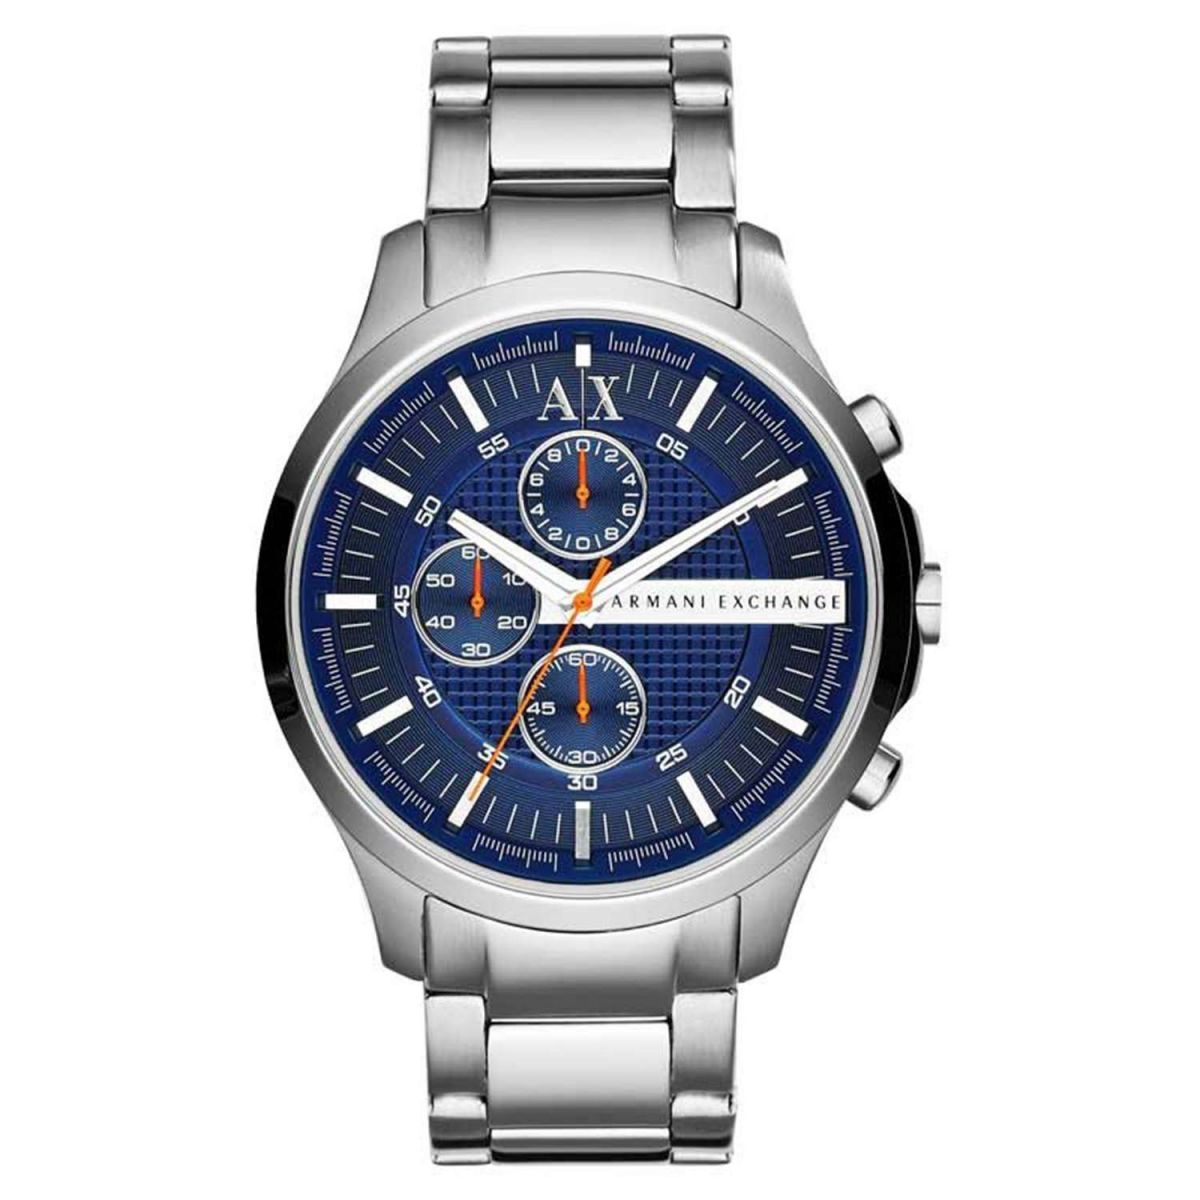 Relógio Armani Exchange AX2155/1Al